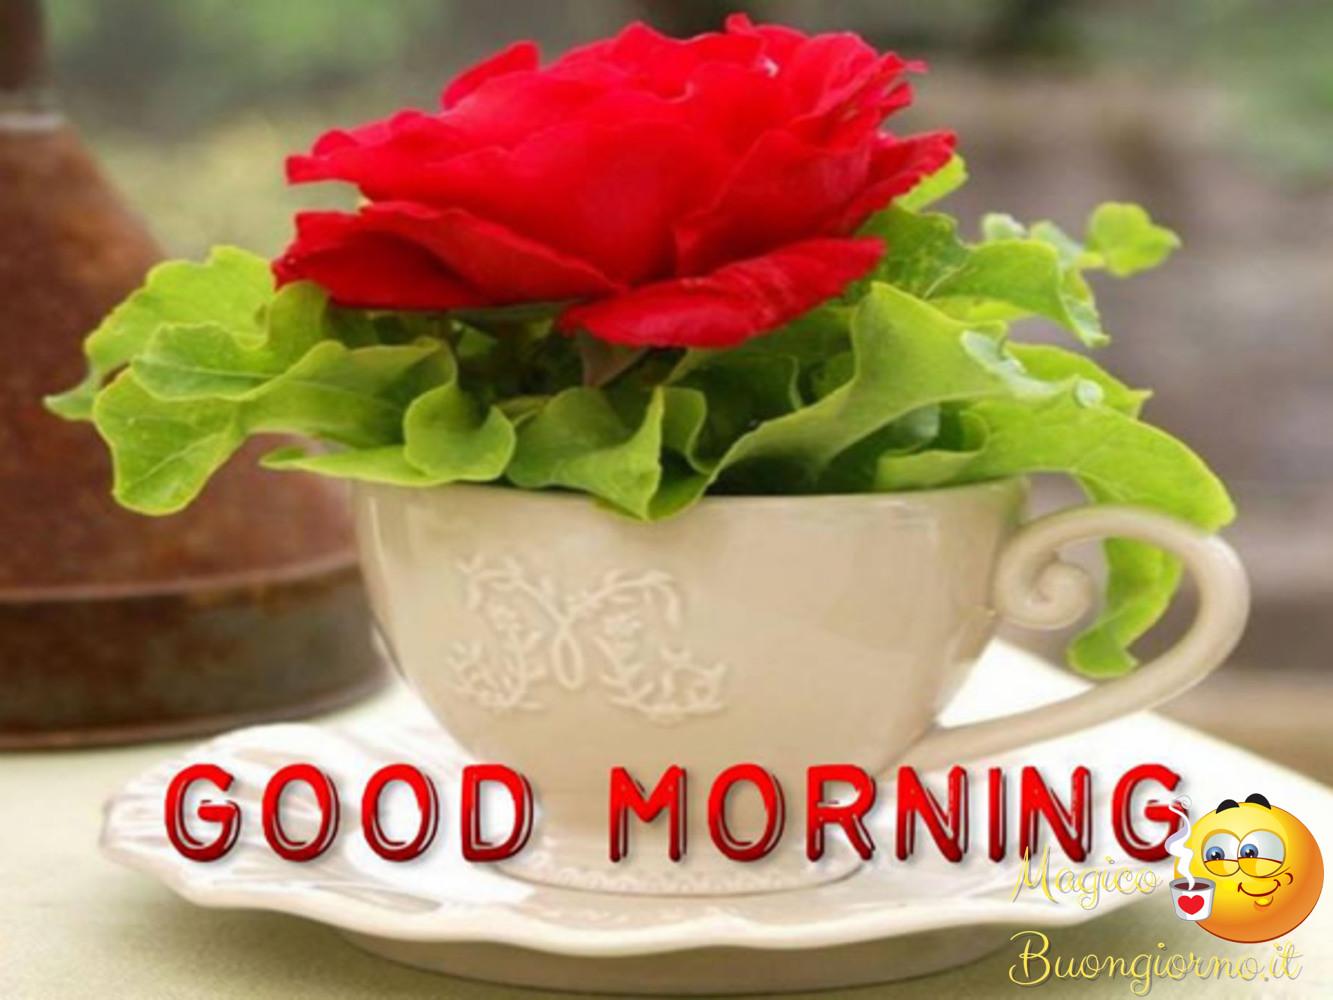 Good Morning Whatsapp Facebook 3